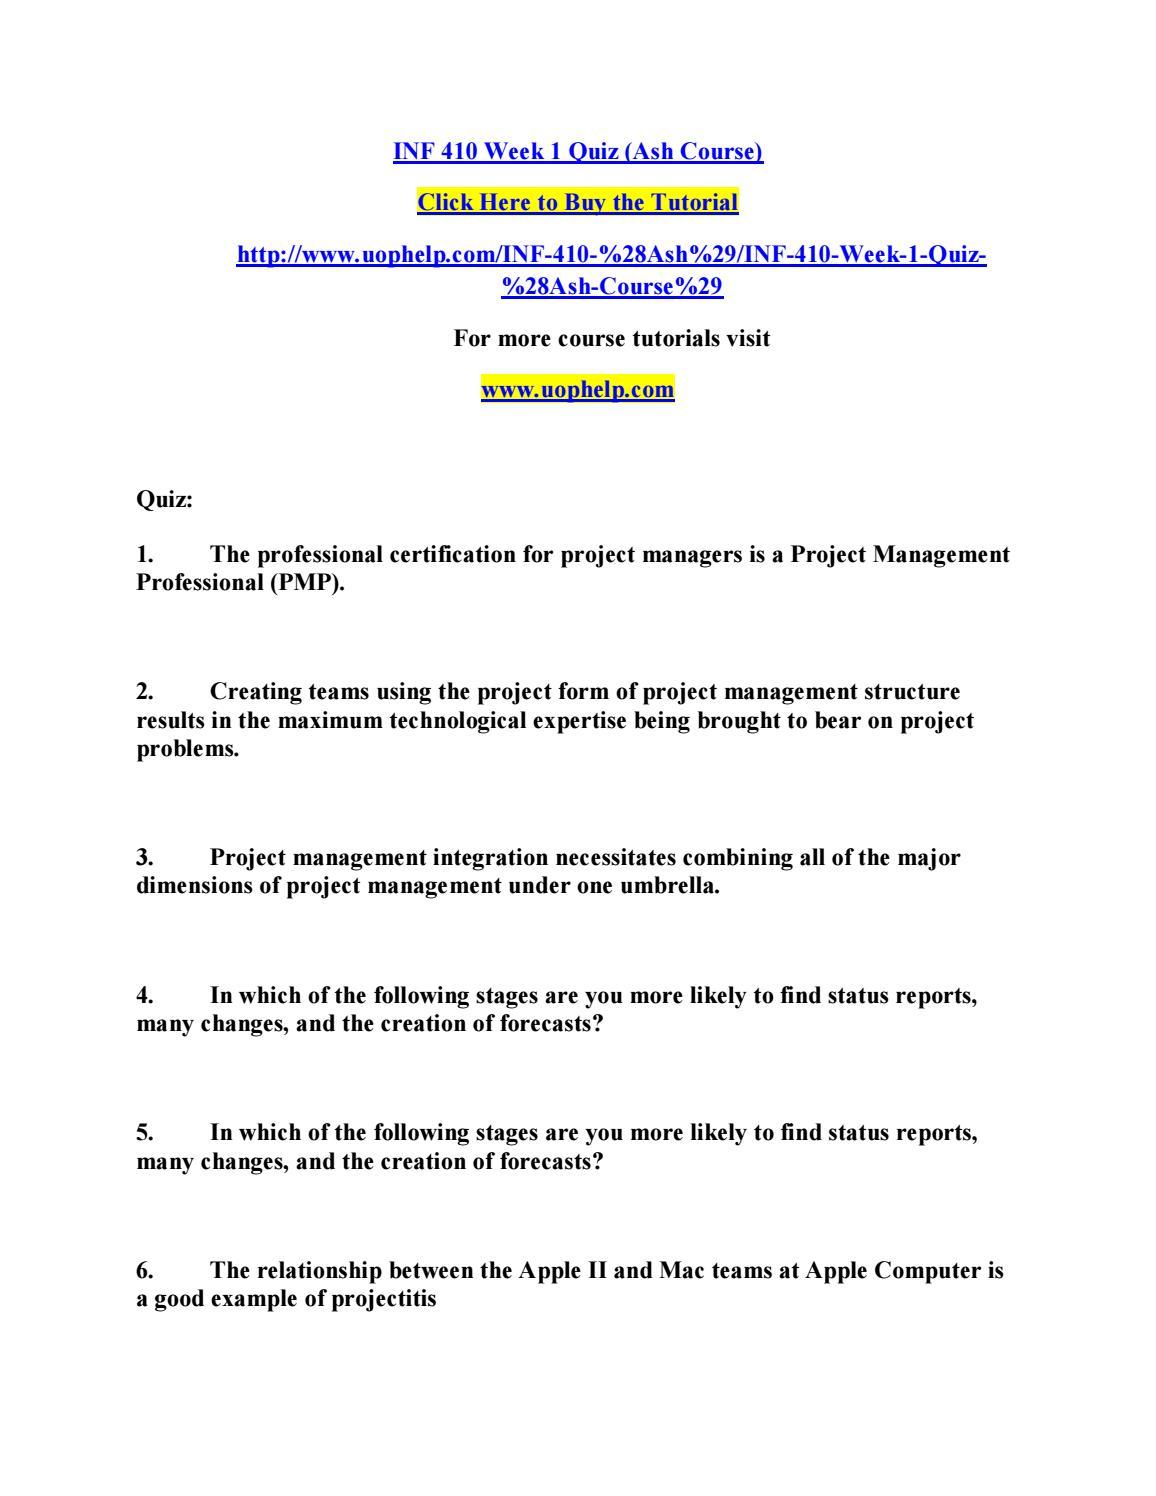 Inf 410 Week 1 Quiz Ash Course By Pinck152 Issuu